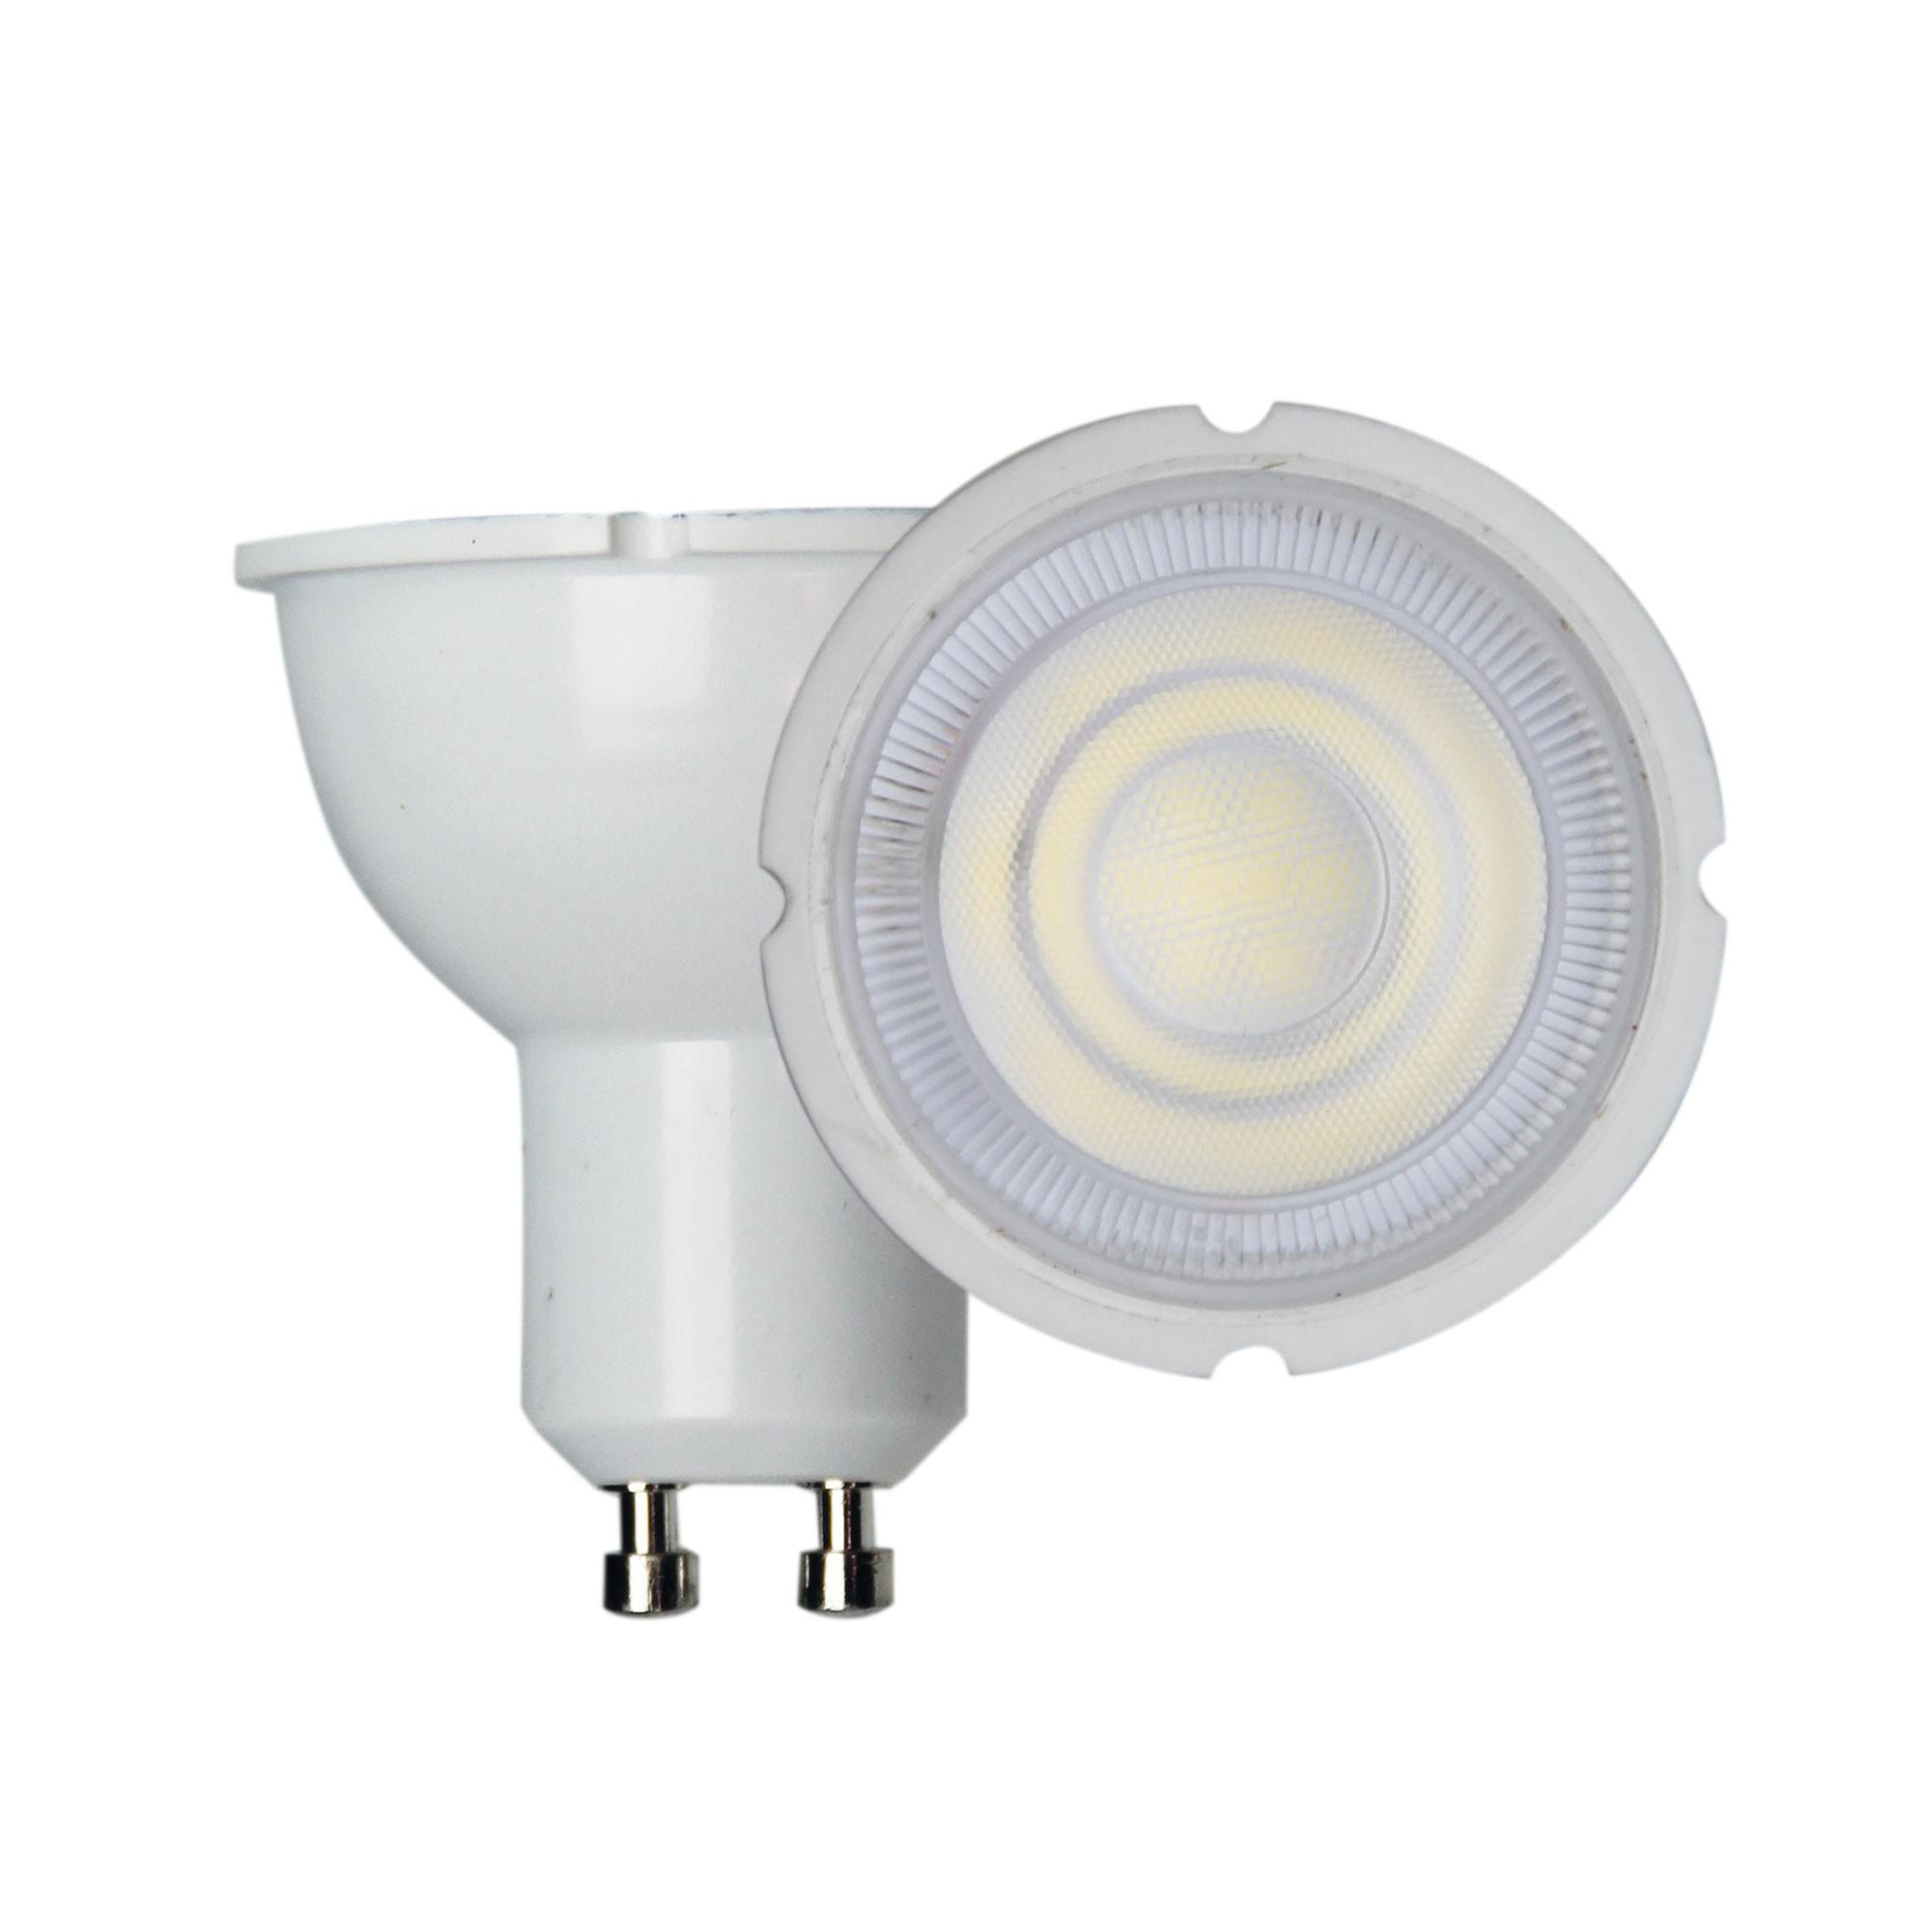 Allume Dimmable LED Globe, 7W, GU10, 3000K, White